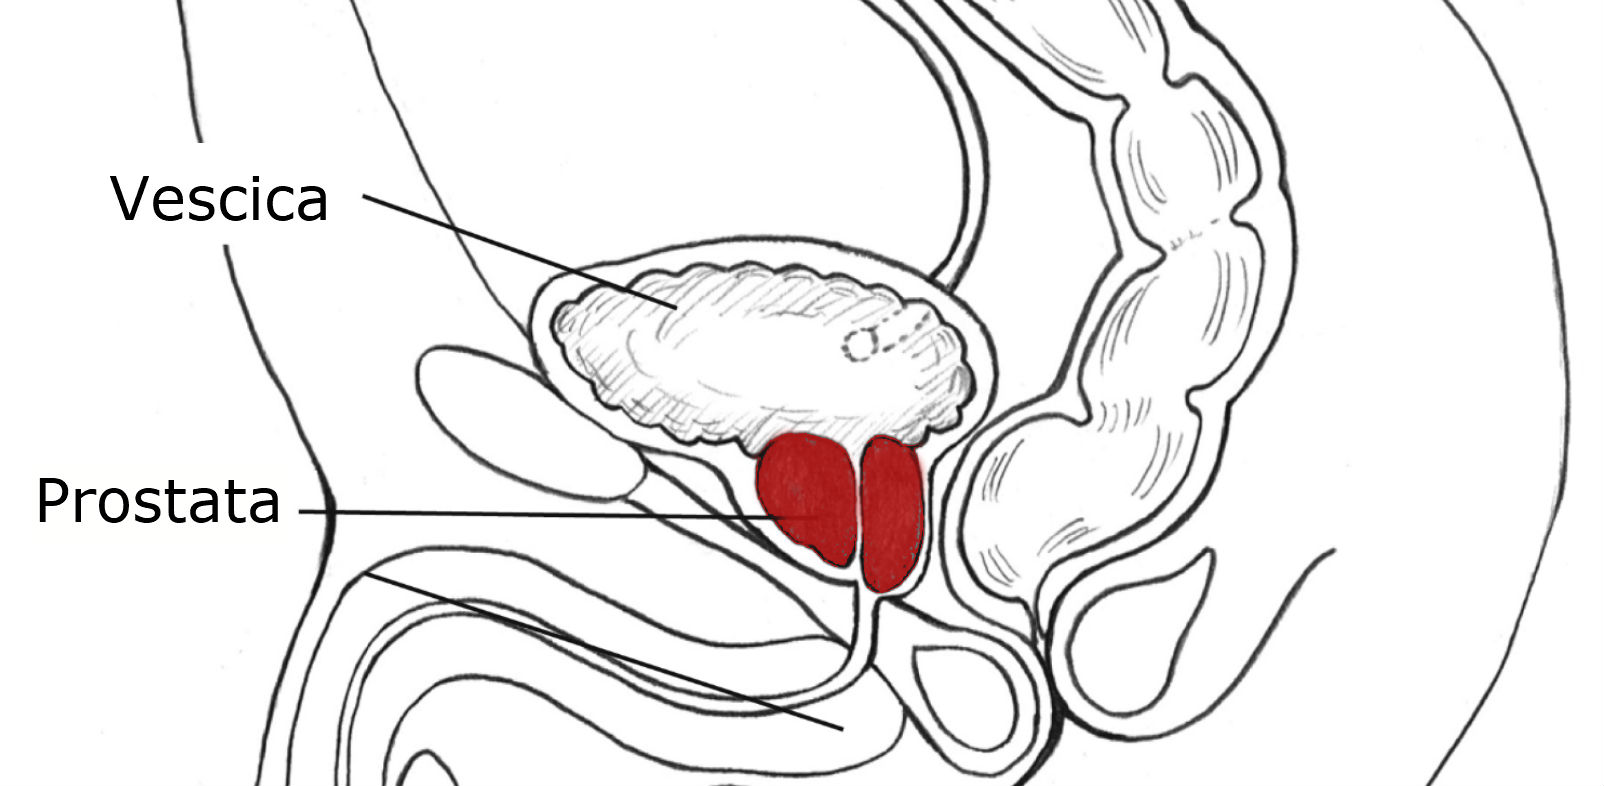 risonanza magnetica prostatica multiparametrica quanto dura